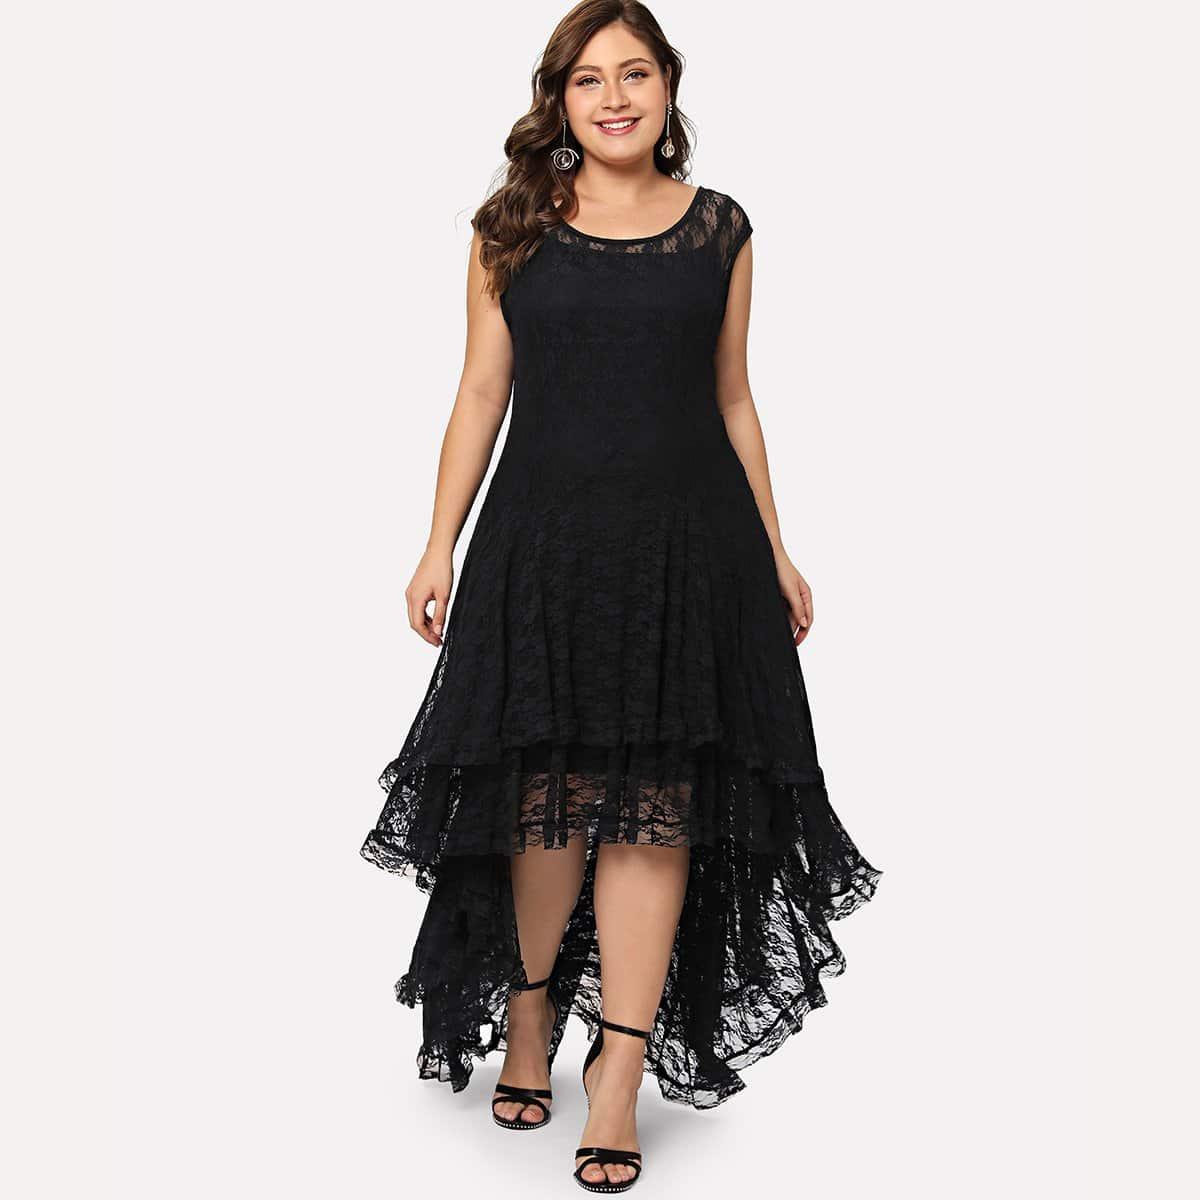 Meerlagige jurk met kant